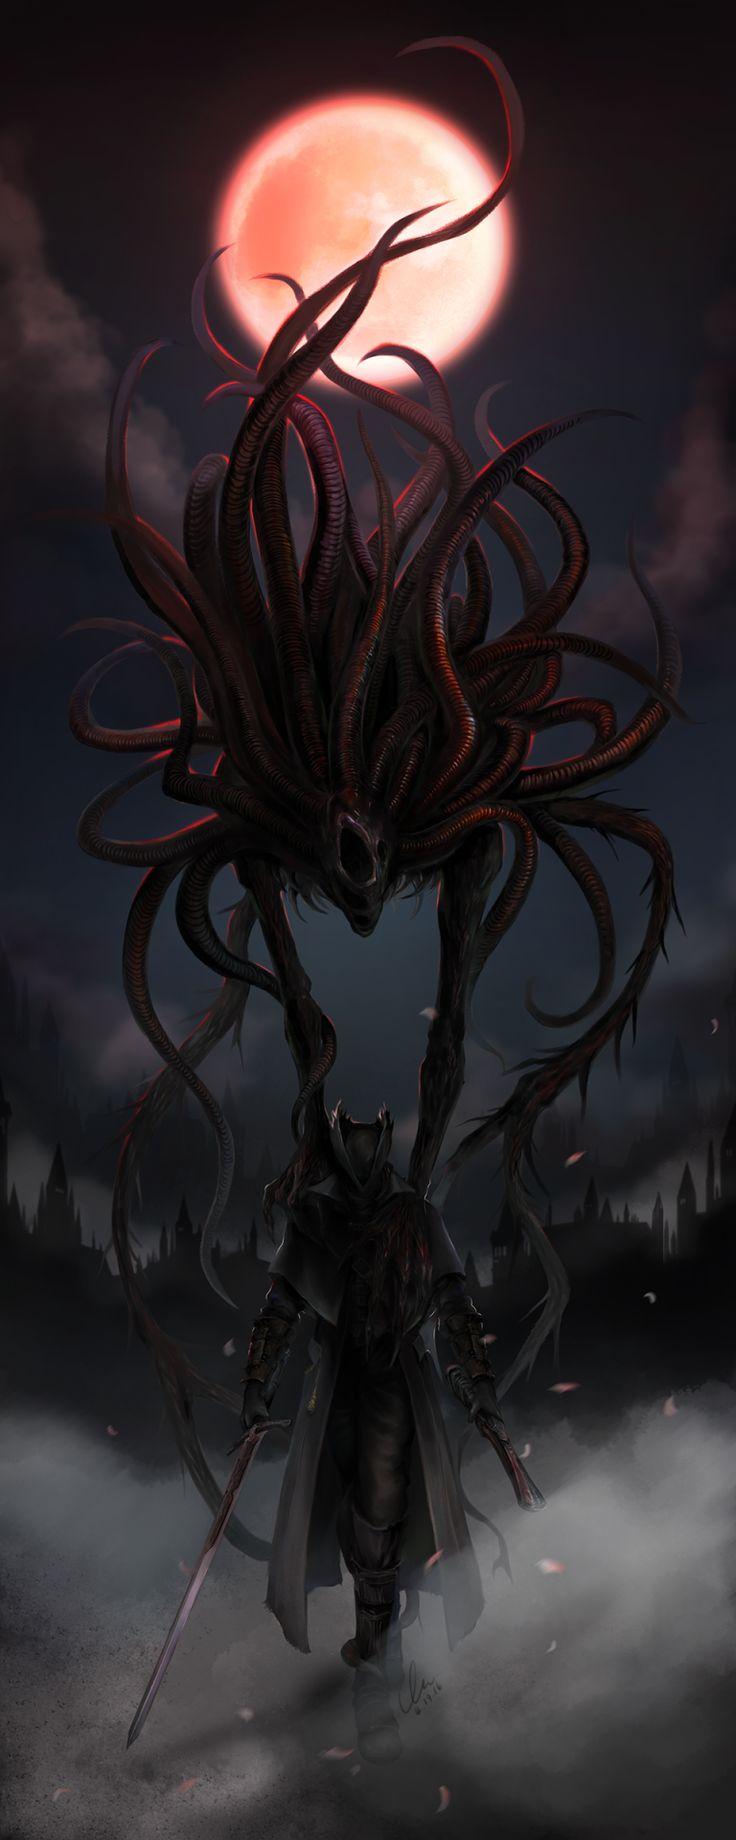 Nooruk's Lair | Bloodborne & Soul series collaboration. I'd...